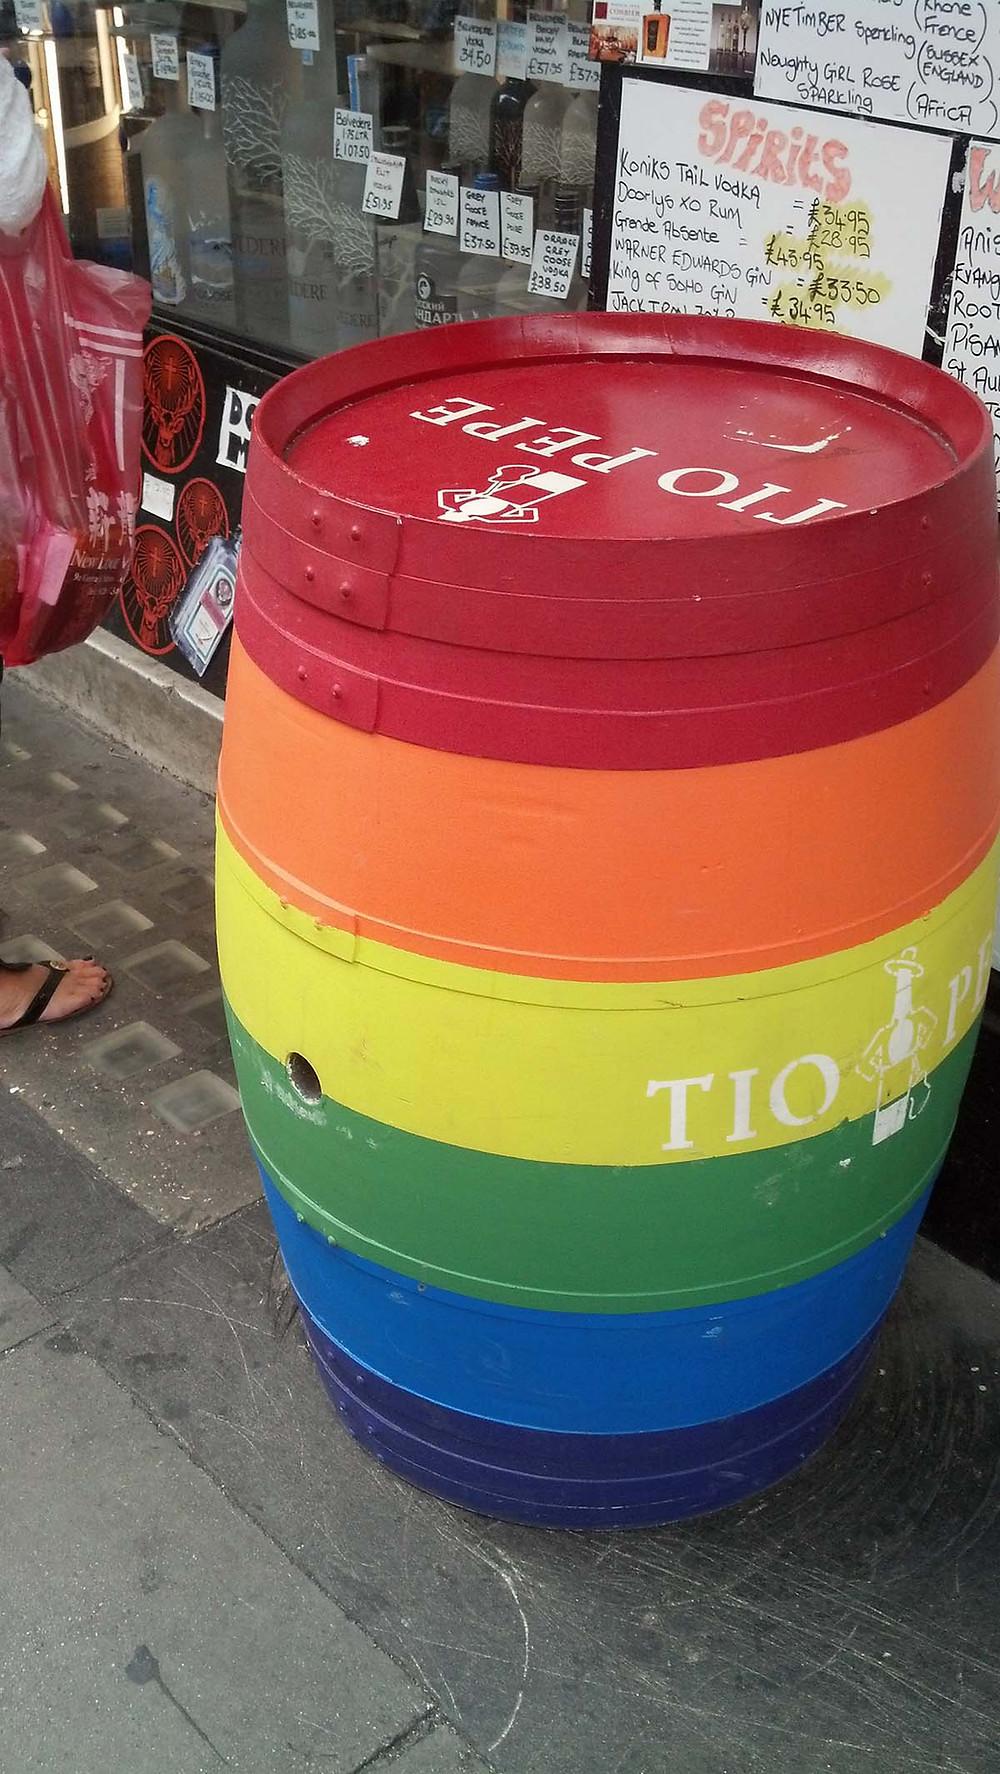 Rainbow barrel, London, England